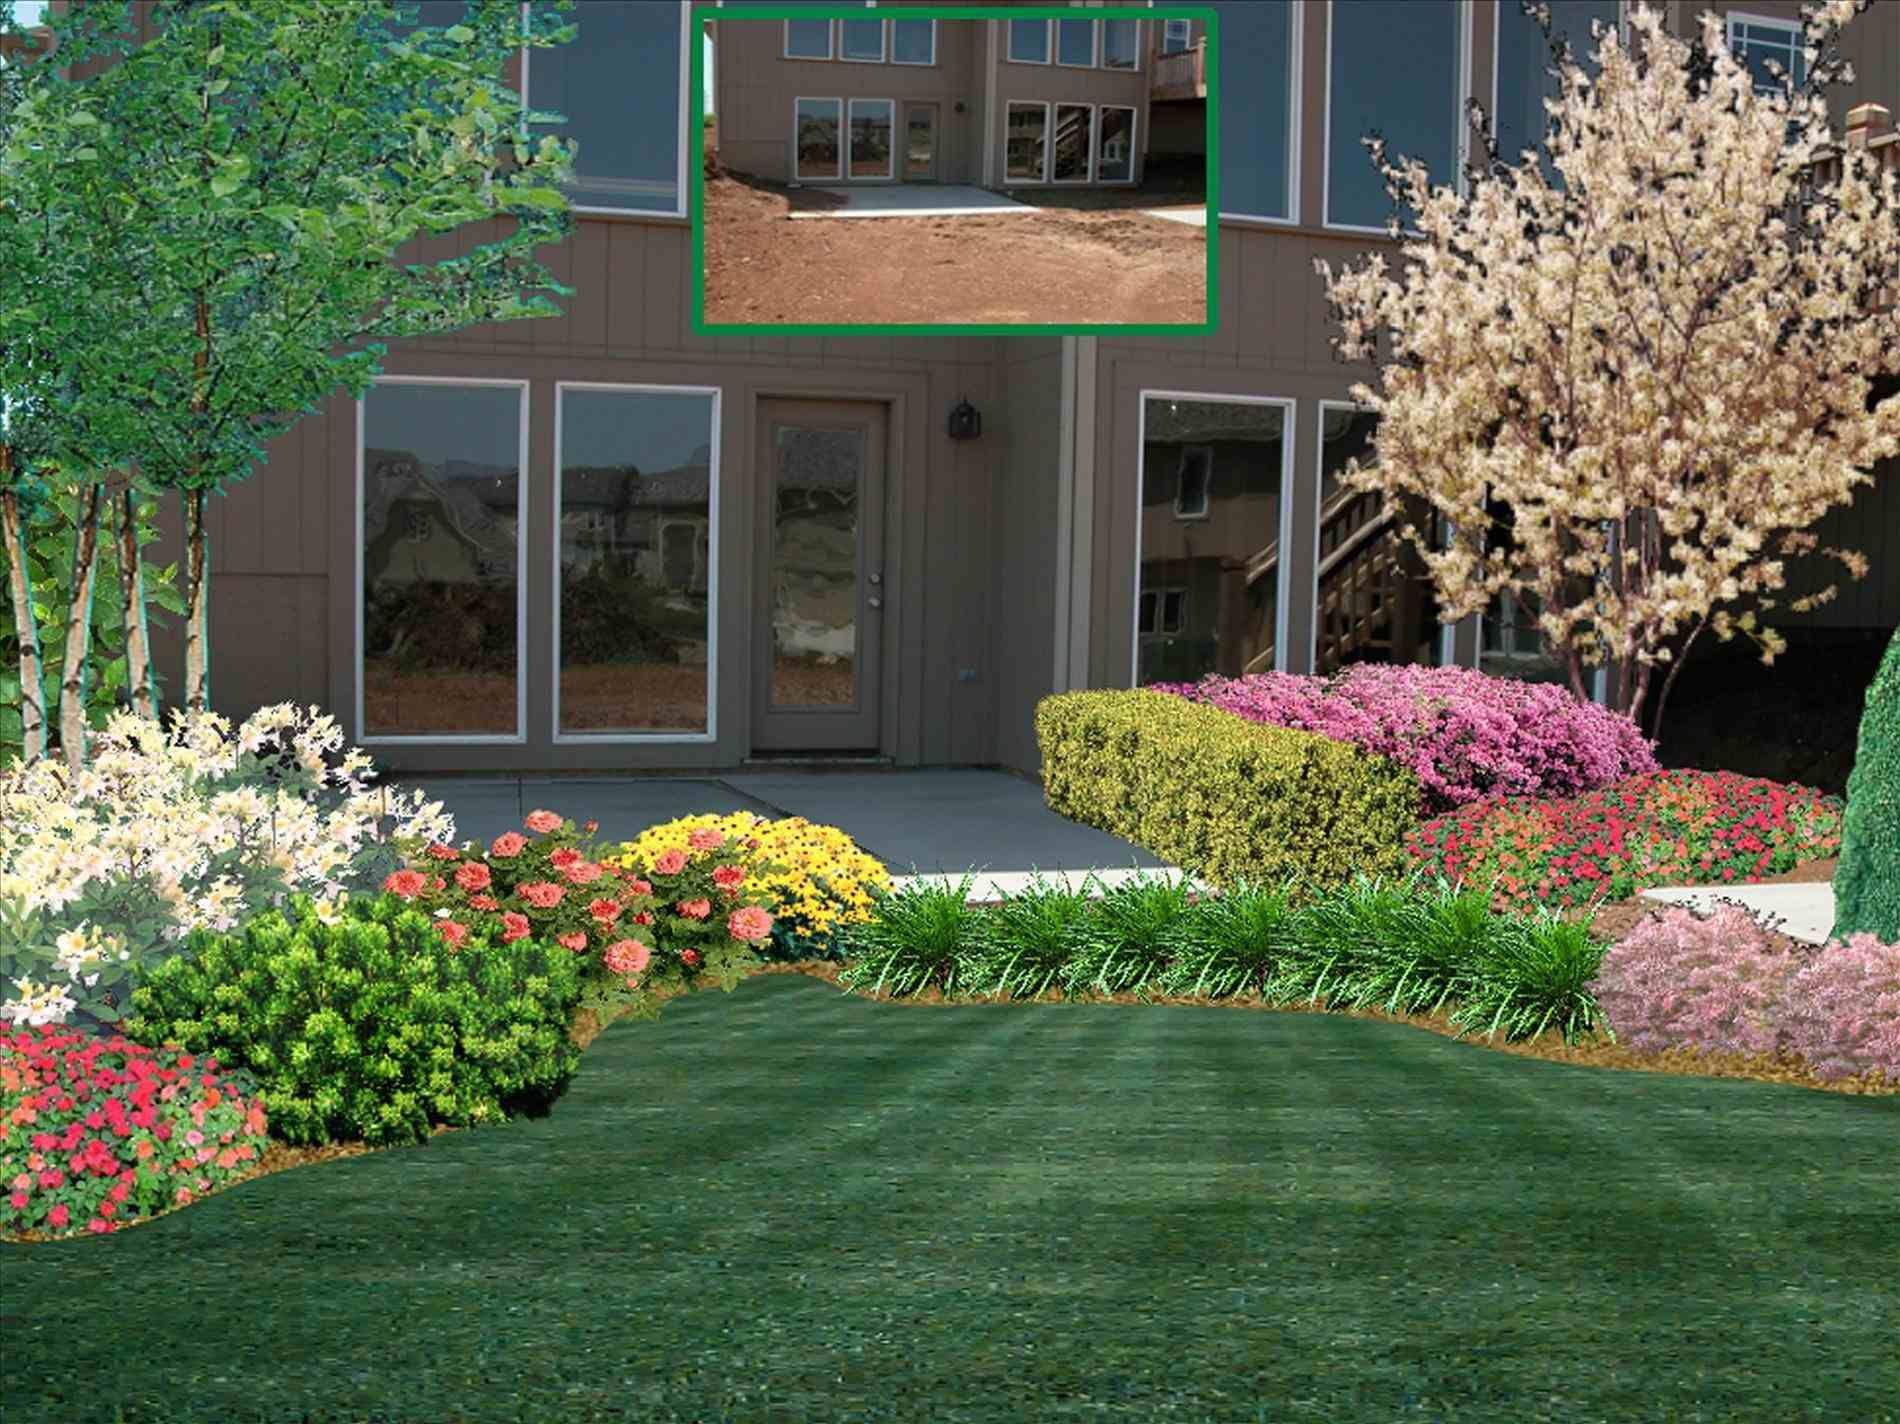 868eec0f22c36fc0bb835c4d0148aa0c - Better Homes And Gardens Design Ideas